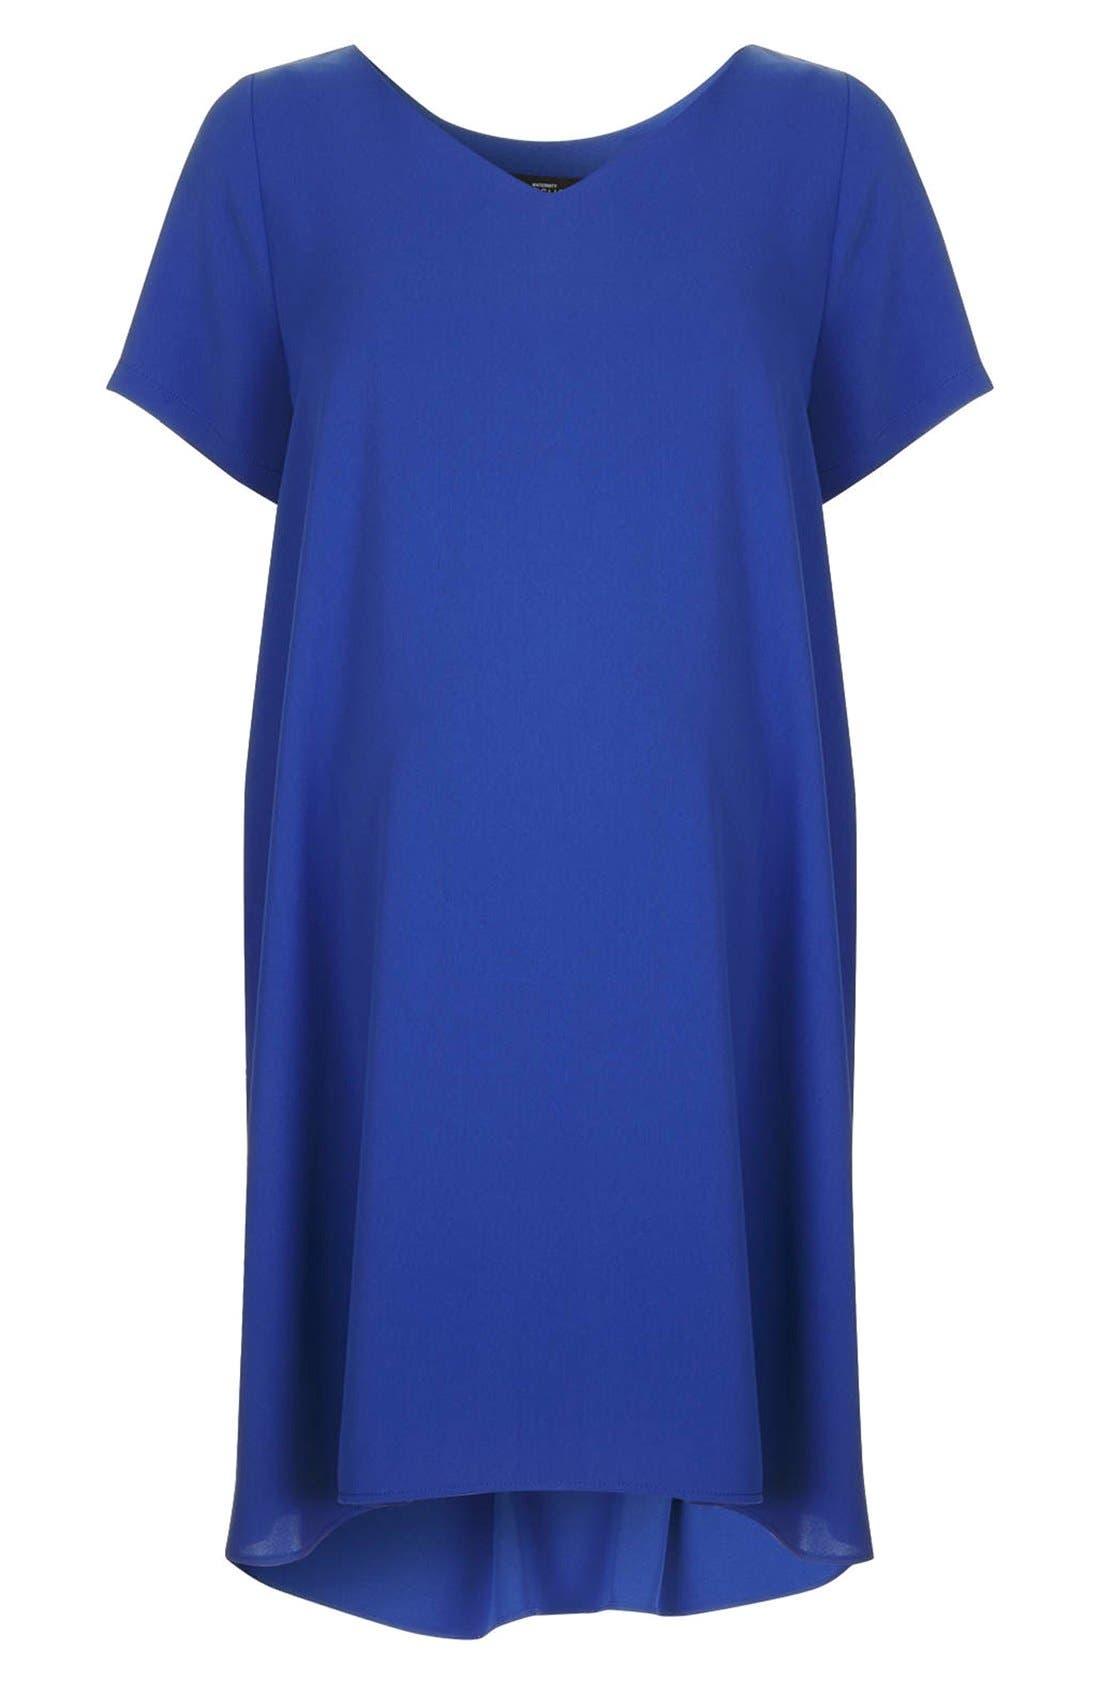 Alternate Image 1 Selected - Topshop V-Neck Maternity Swing Dress